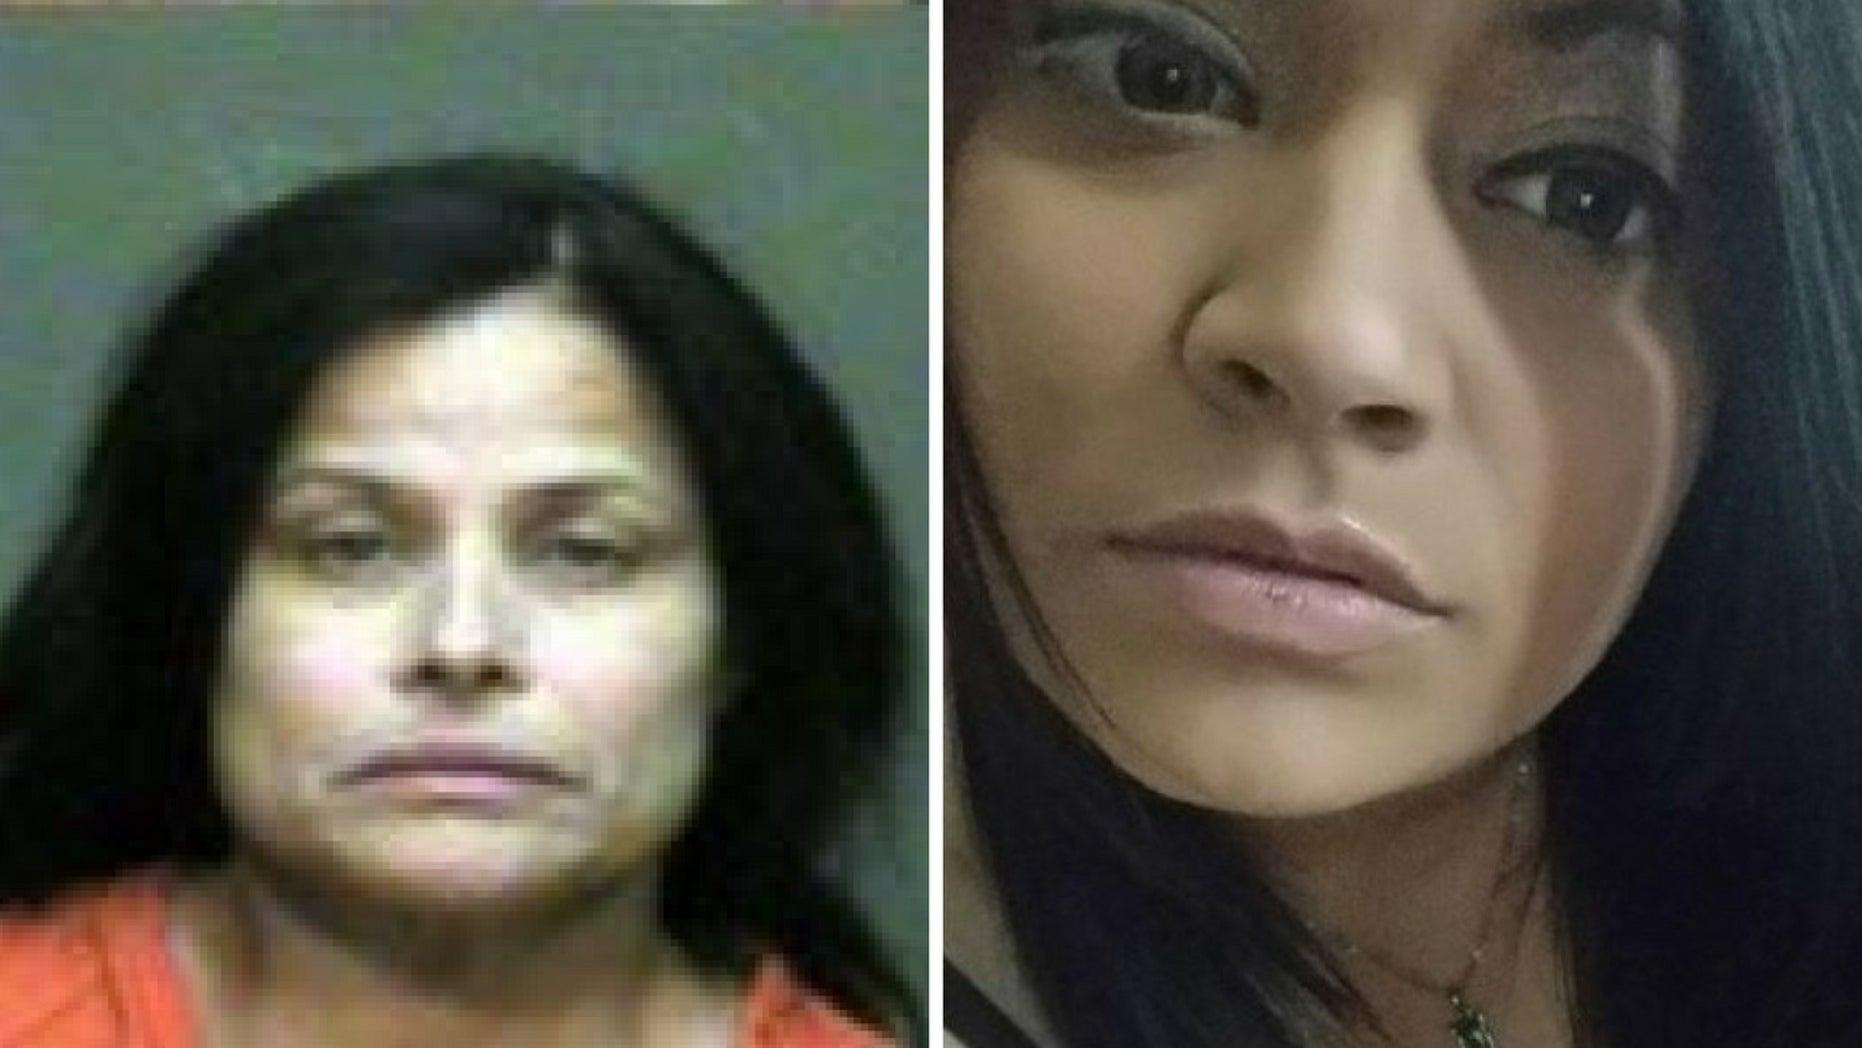 Juanita Gomez, left, was convicted of killing her daughter, Geneva Gomez, right.